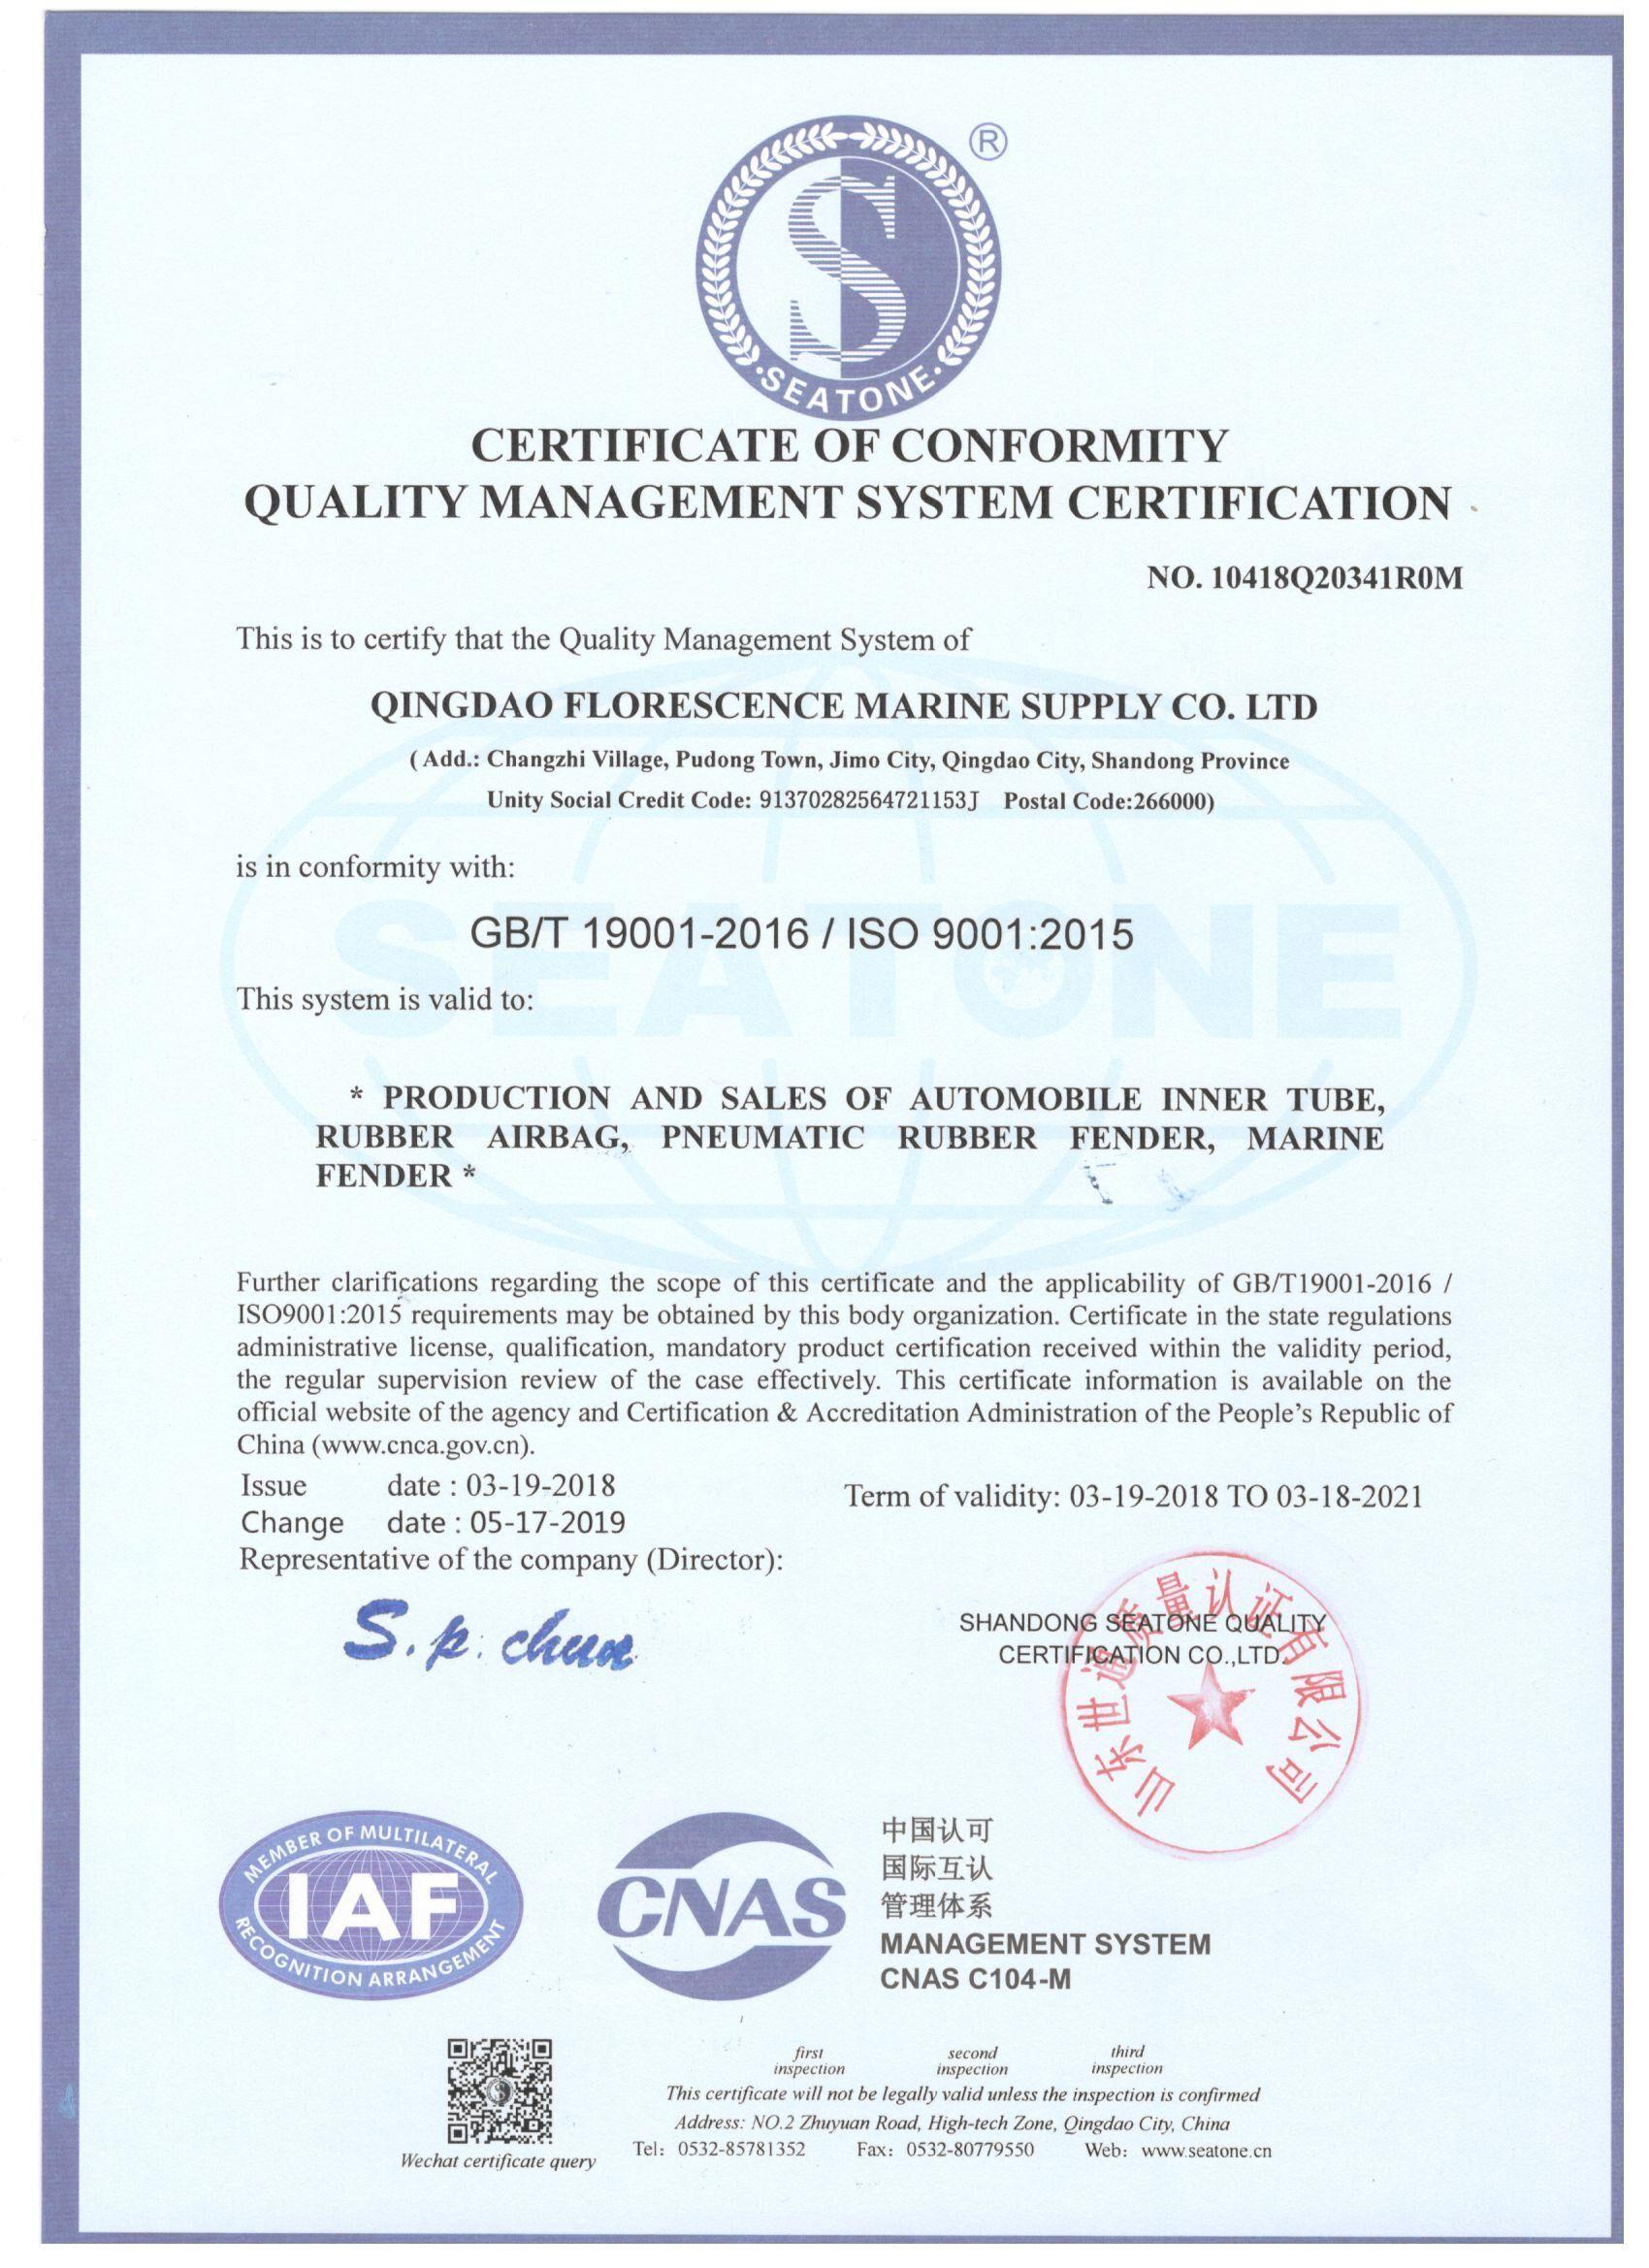 ISO9001--Qingdao Florescence Marine Supply